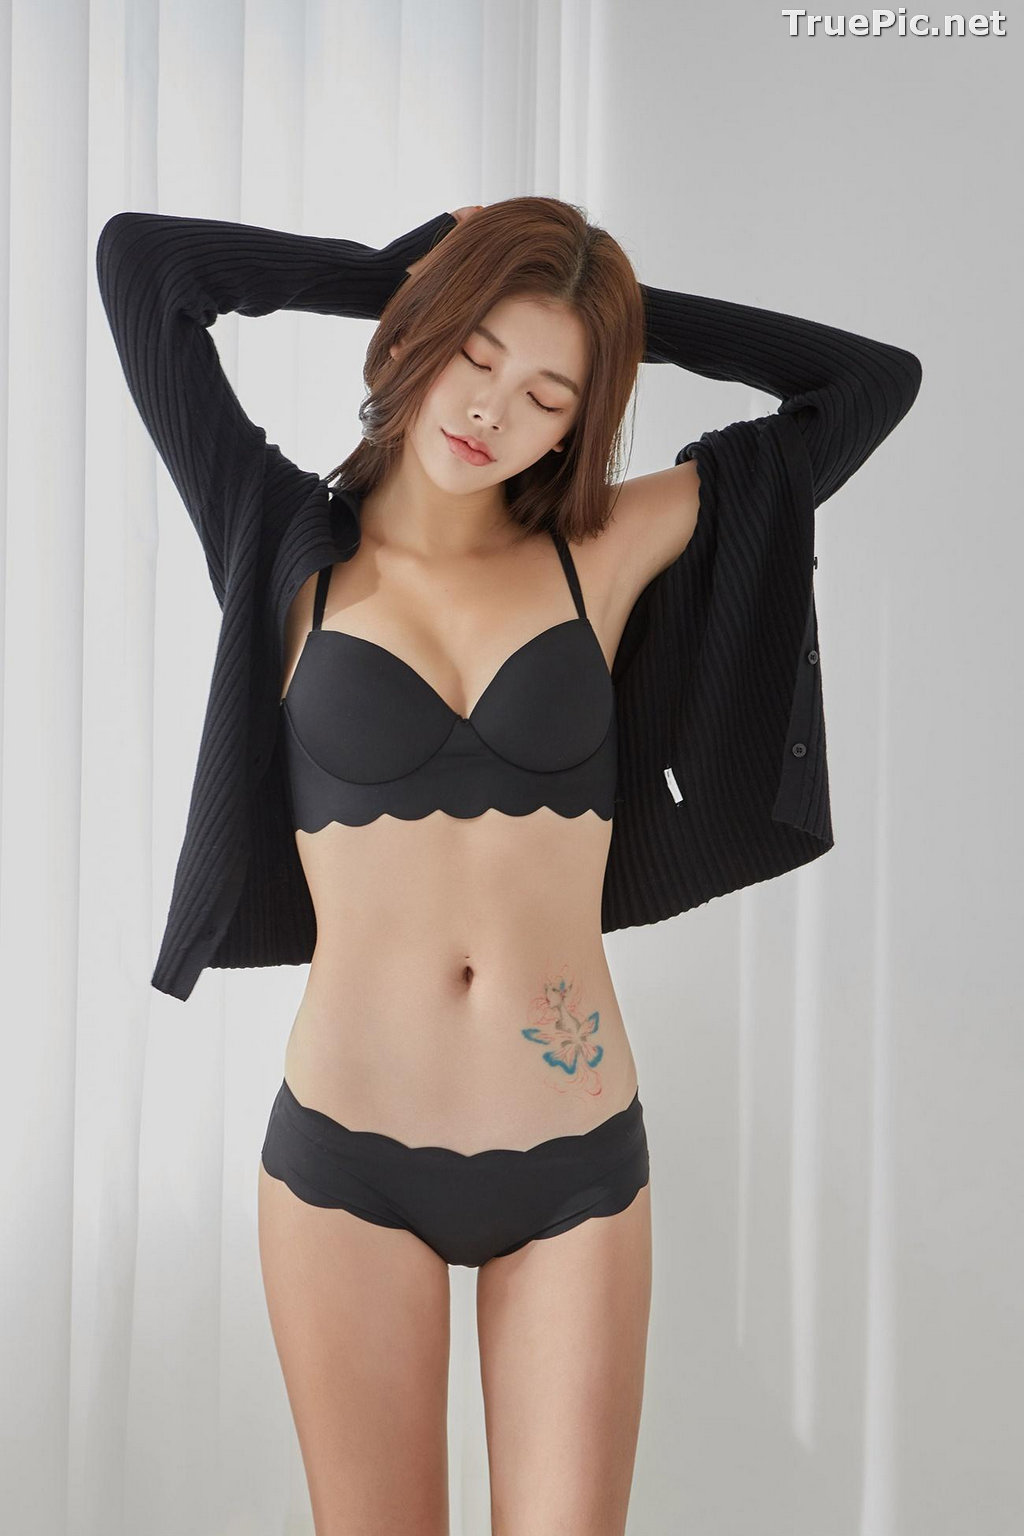 Image Korean Fashion Model – Da Yomi (다요미) – Lountess Spring Lingerie #2 - TruePic.net - Picture-2